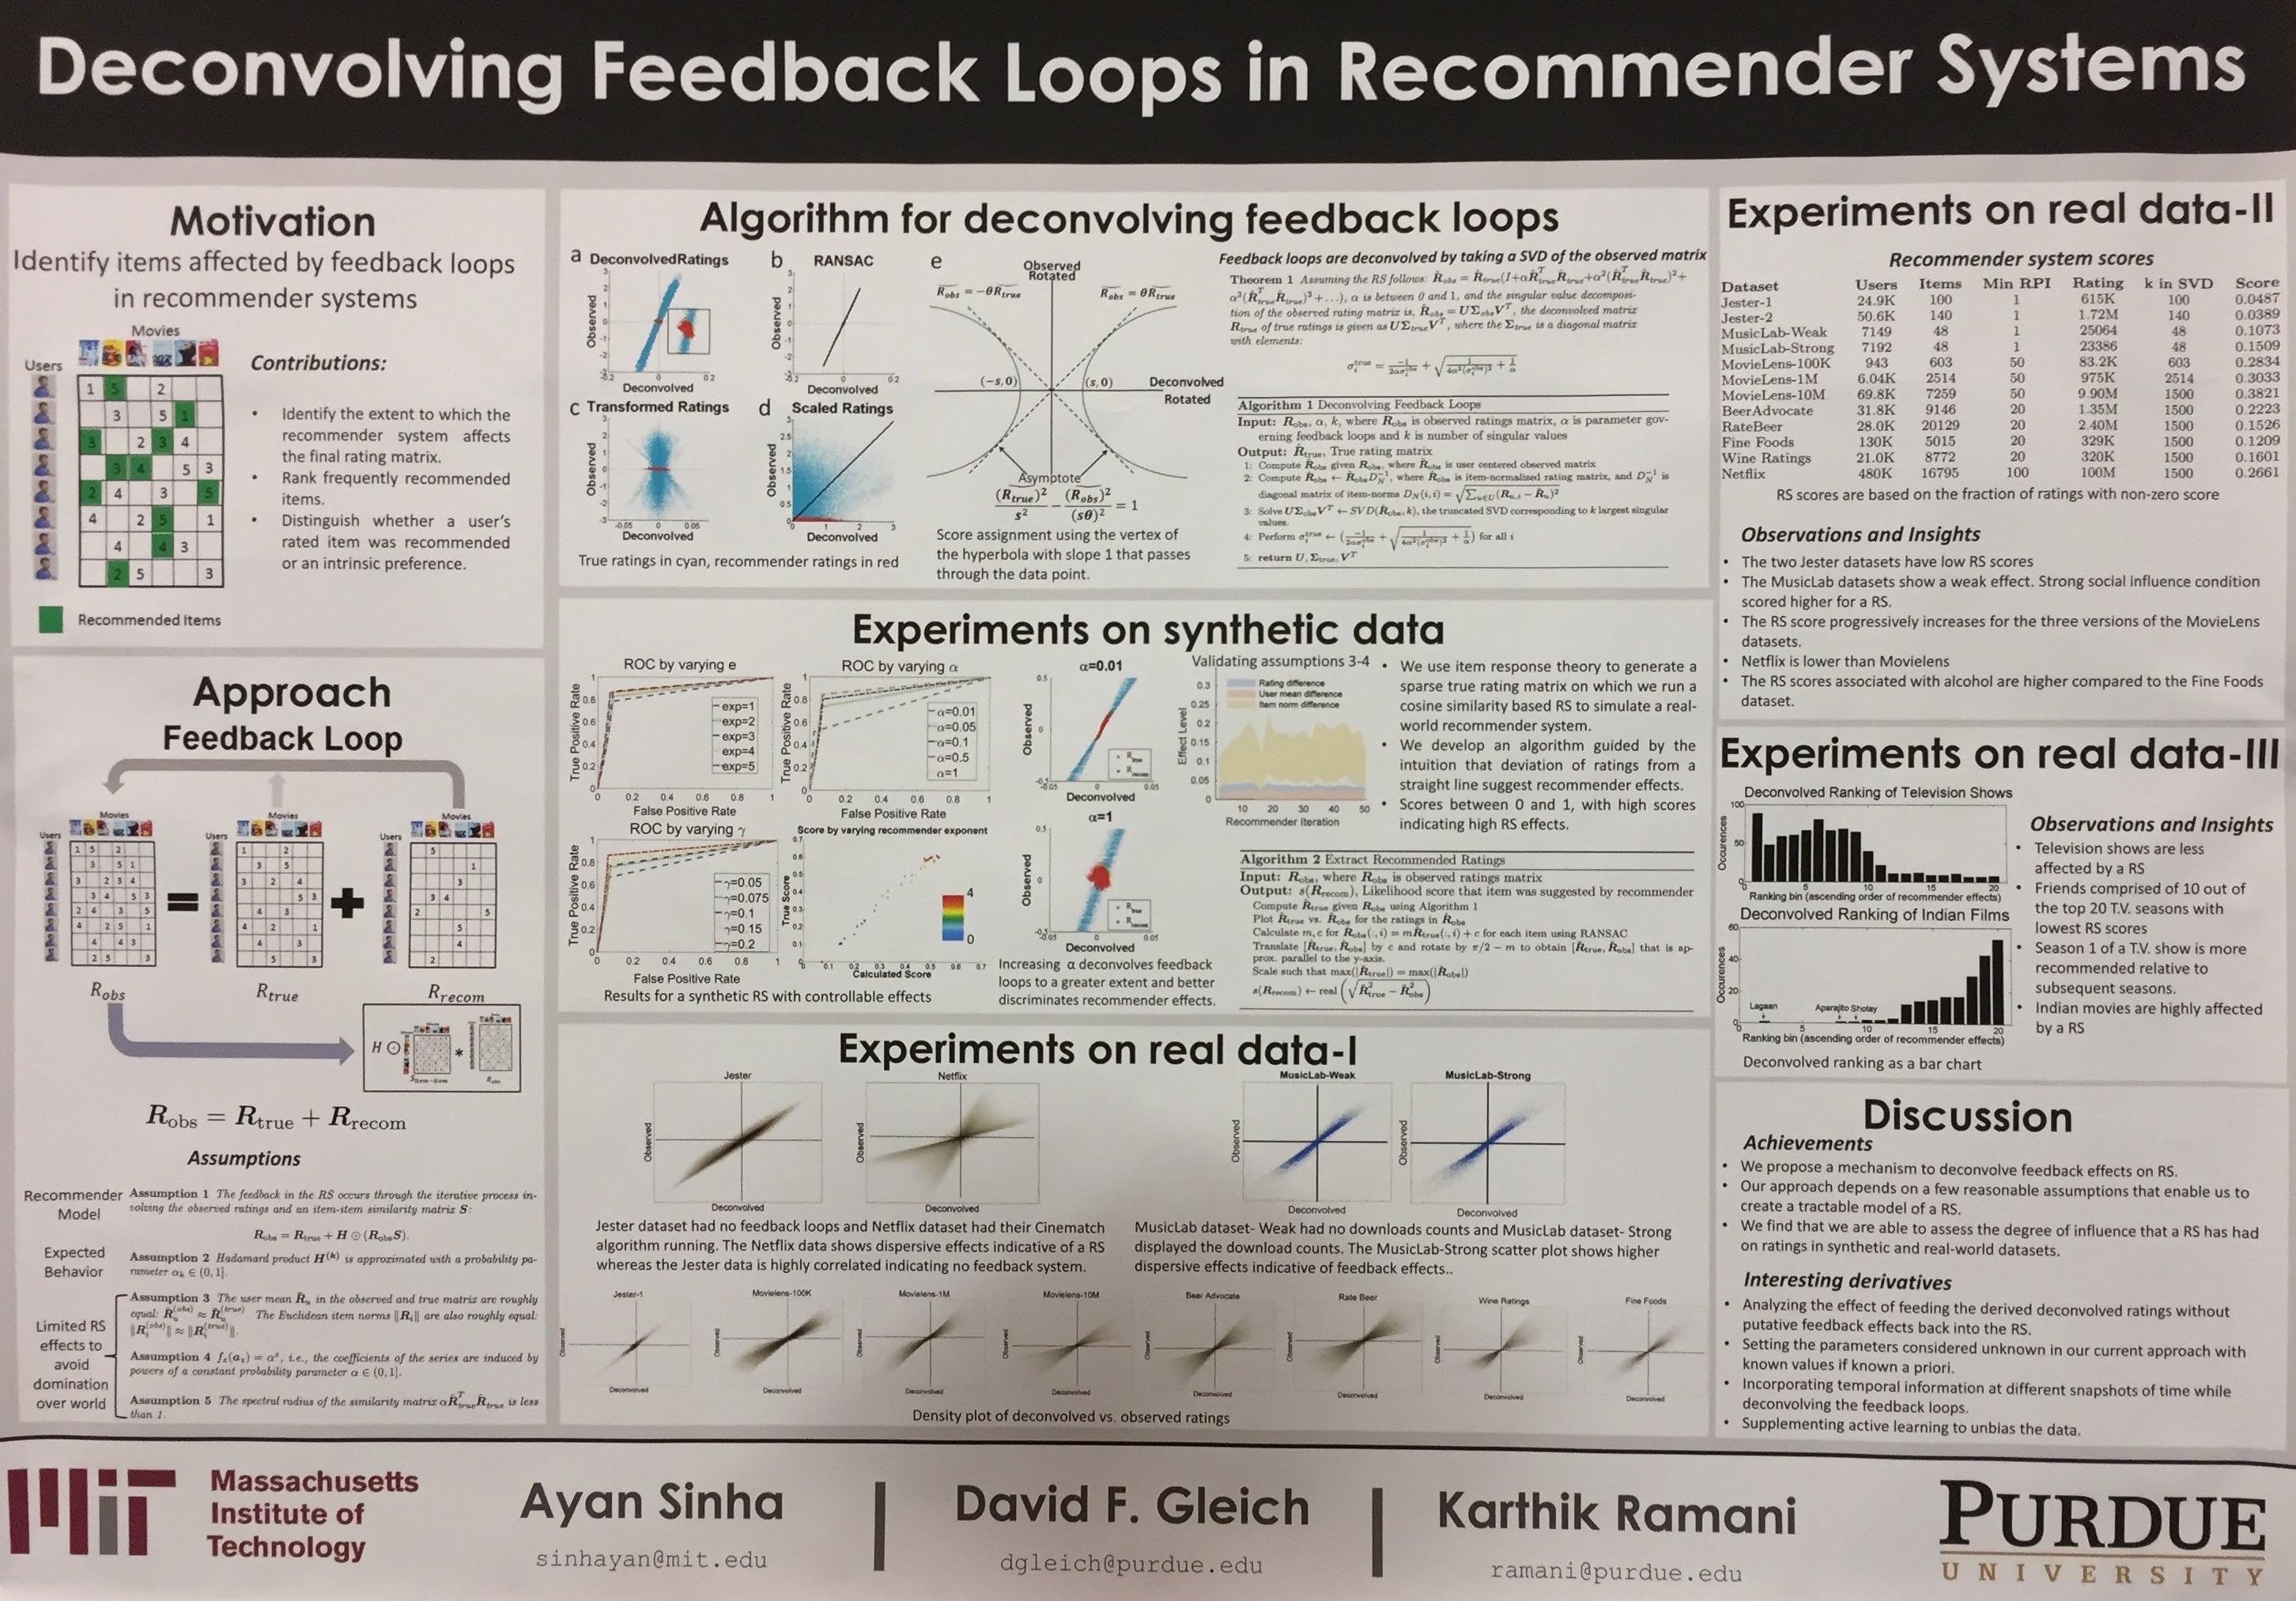 Sinha_Deconvolving_Feedback_Loops_in_Recommender_Systems.jpg